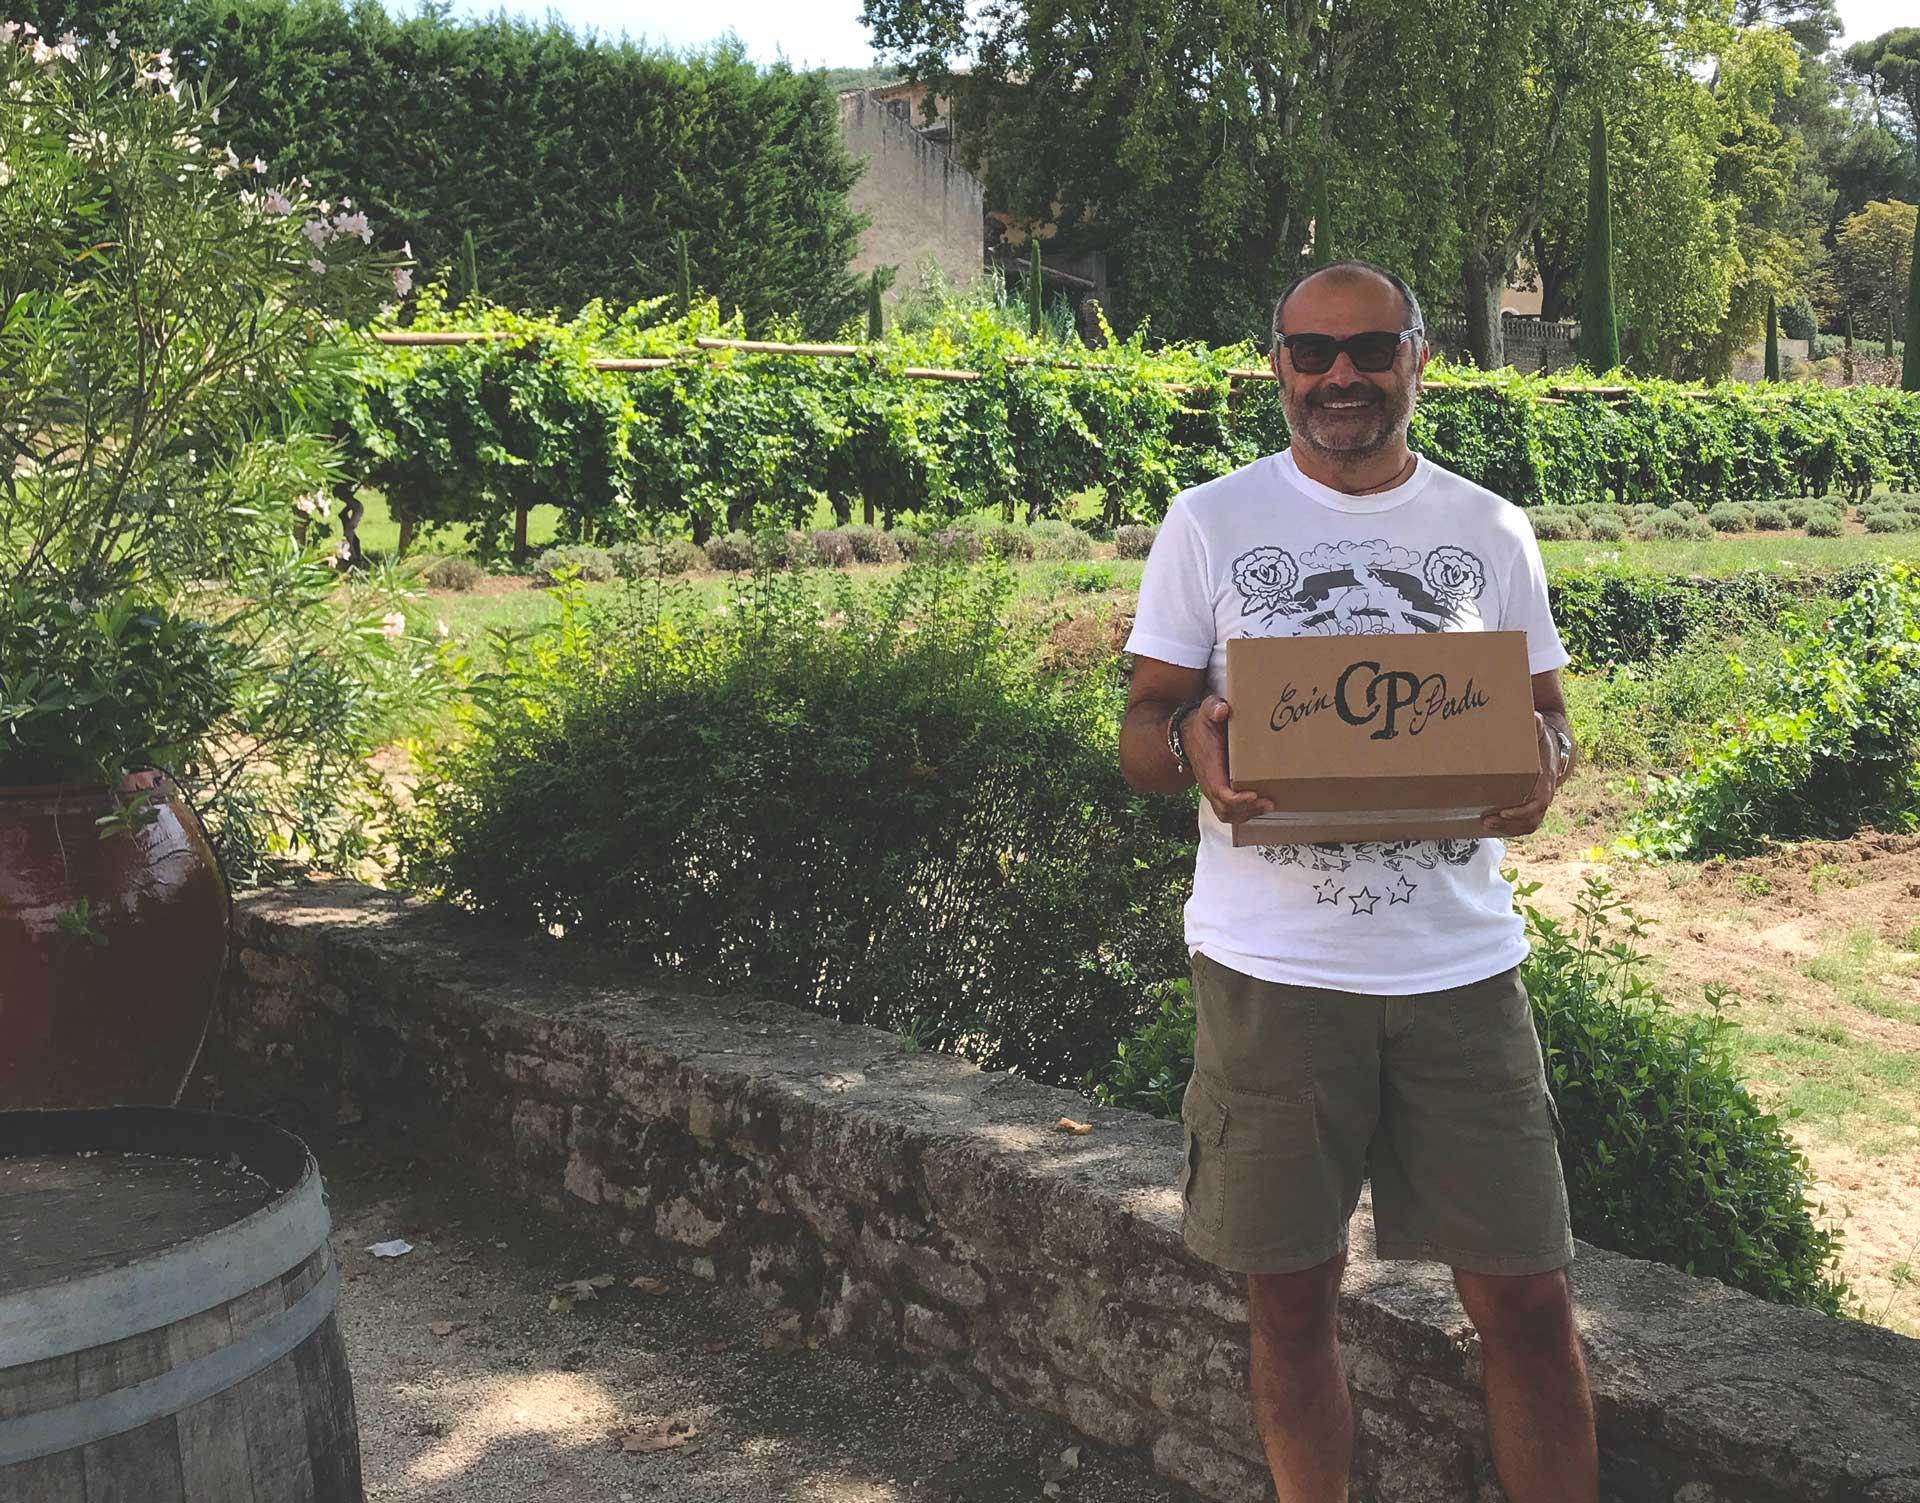 enoteca di vini francesi a torino